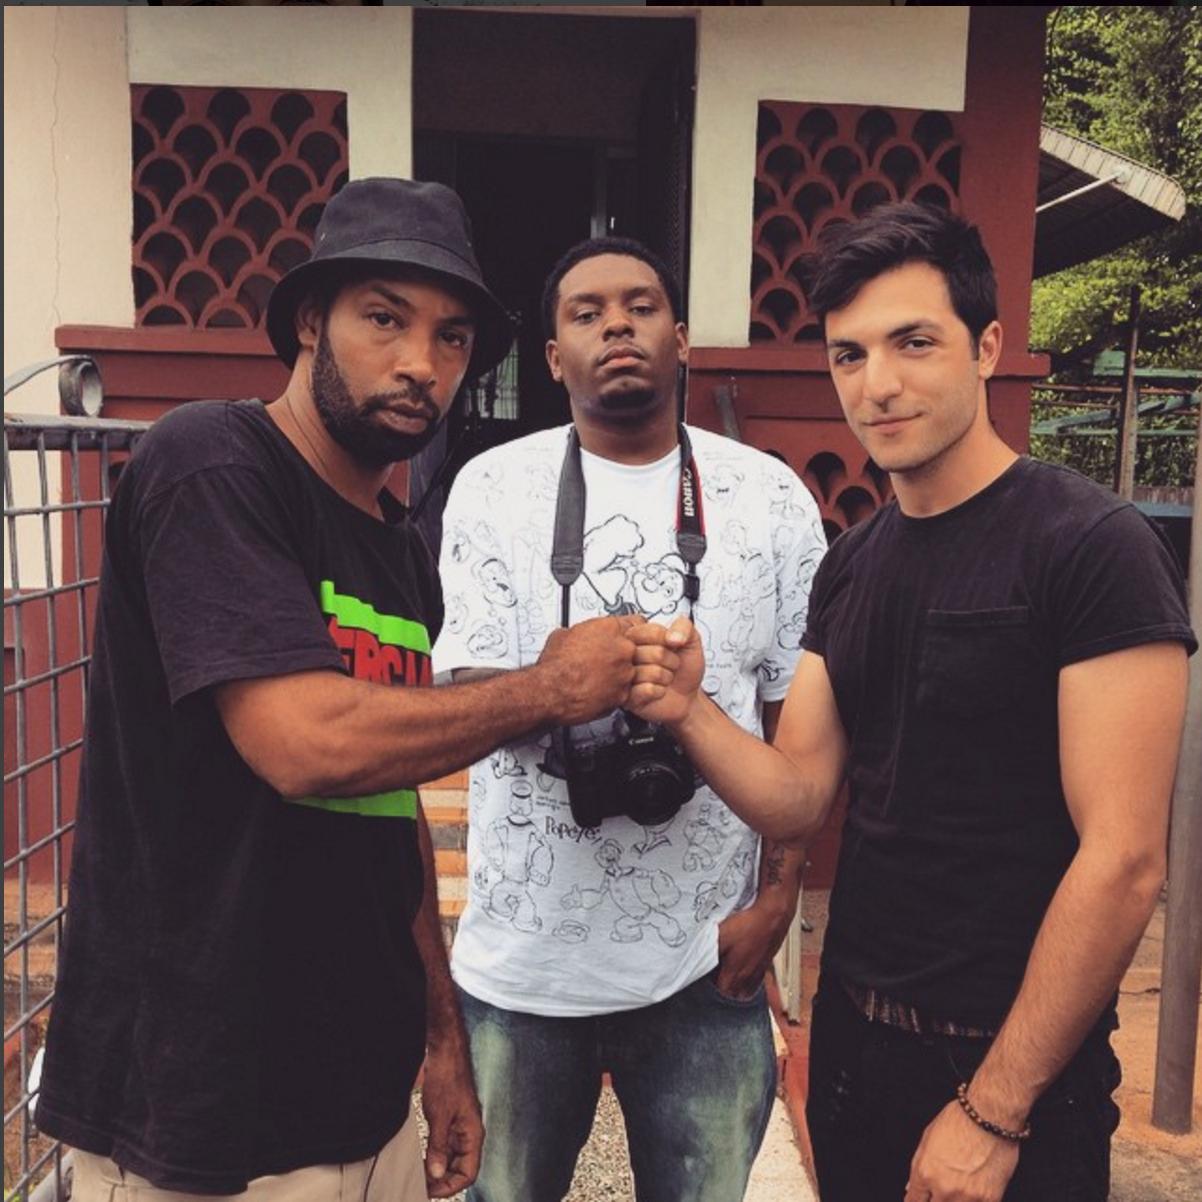 Make It Hapn, DGainz, Cyrus, blunted AF, Trinidad March 2015